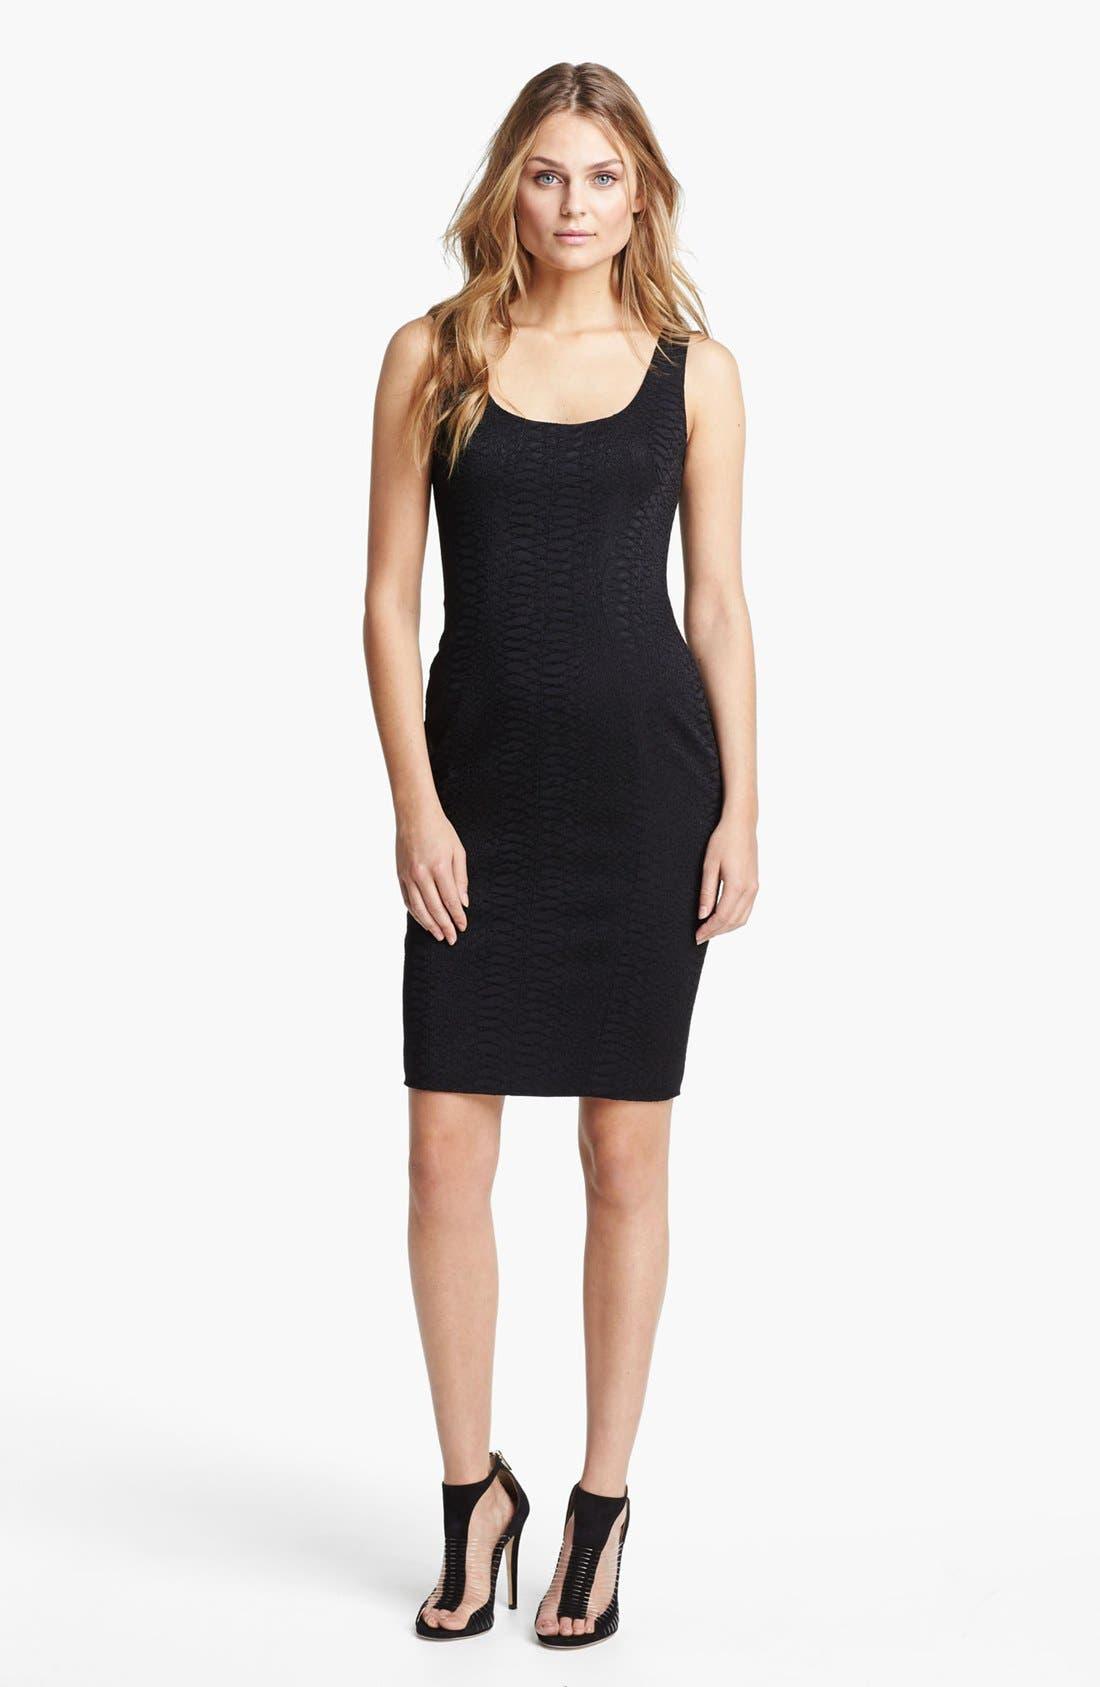 Alternate Image 1 Selected - Jay Godfrey 'Ines' Python Jacquard Dress (Nordstrom Exclusive)